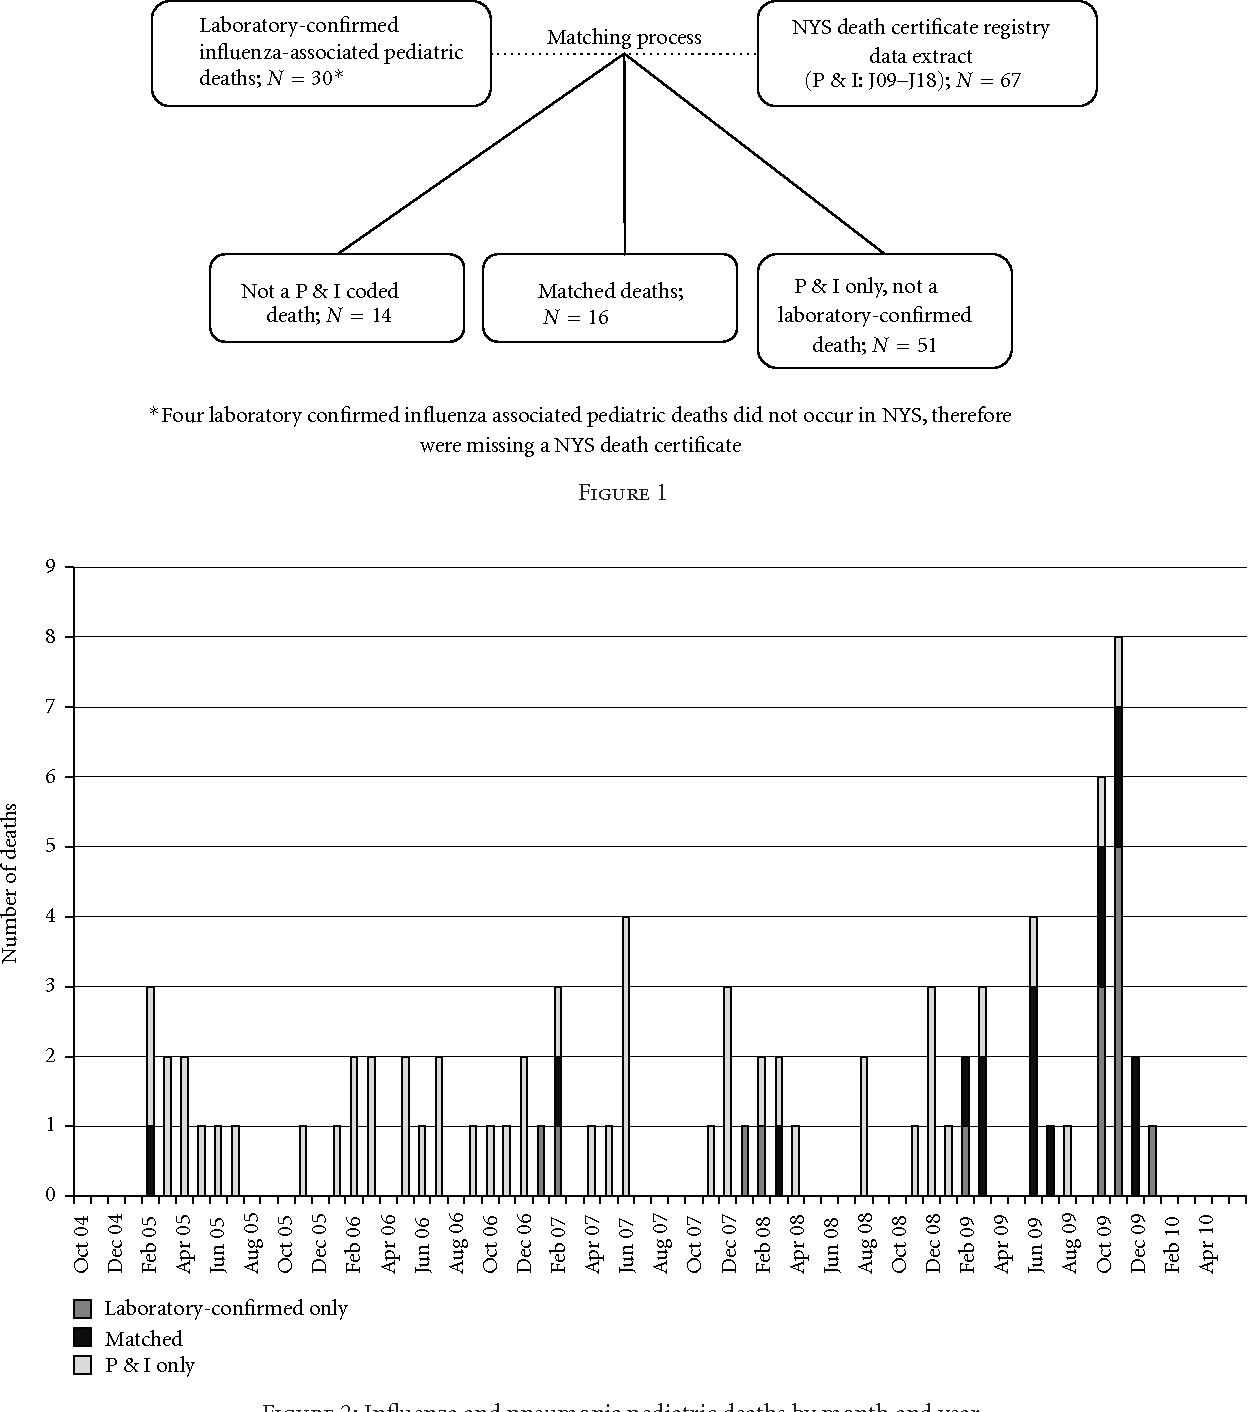 Pediatric Influenza Associated Deaths In New York State Death